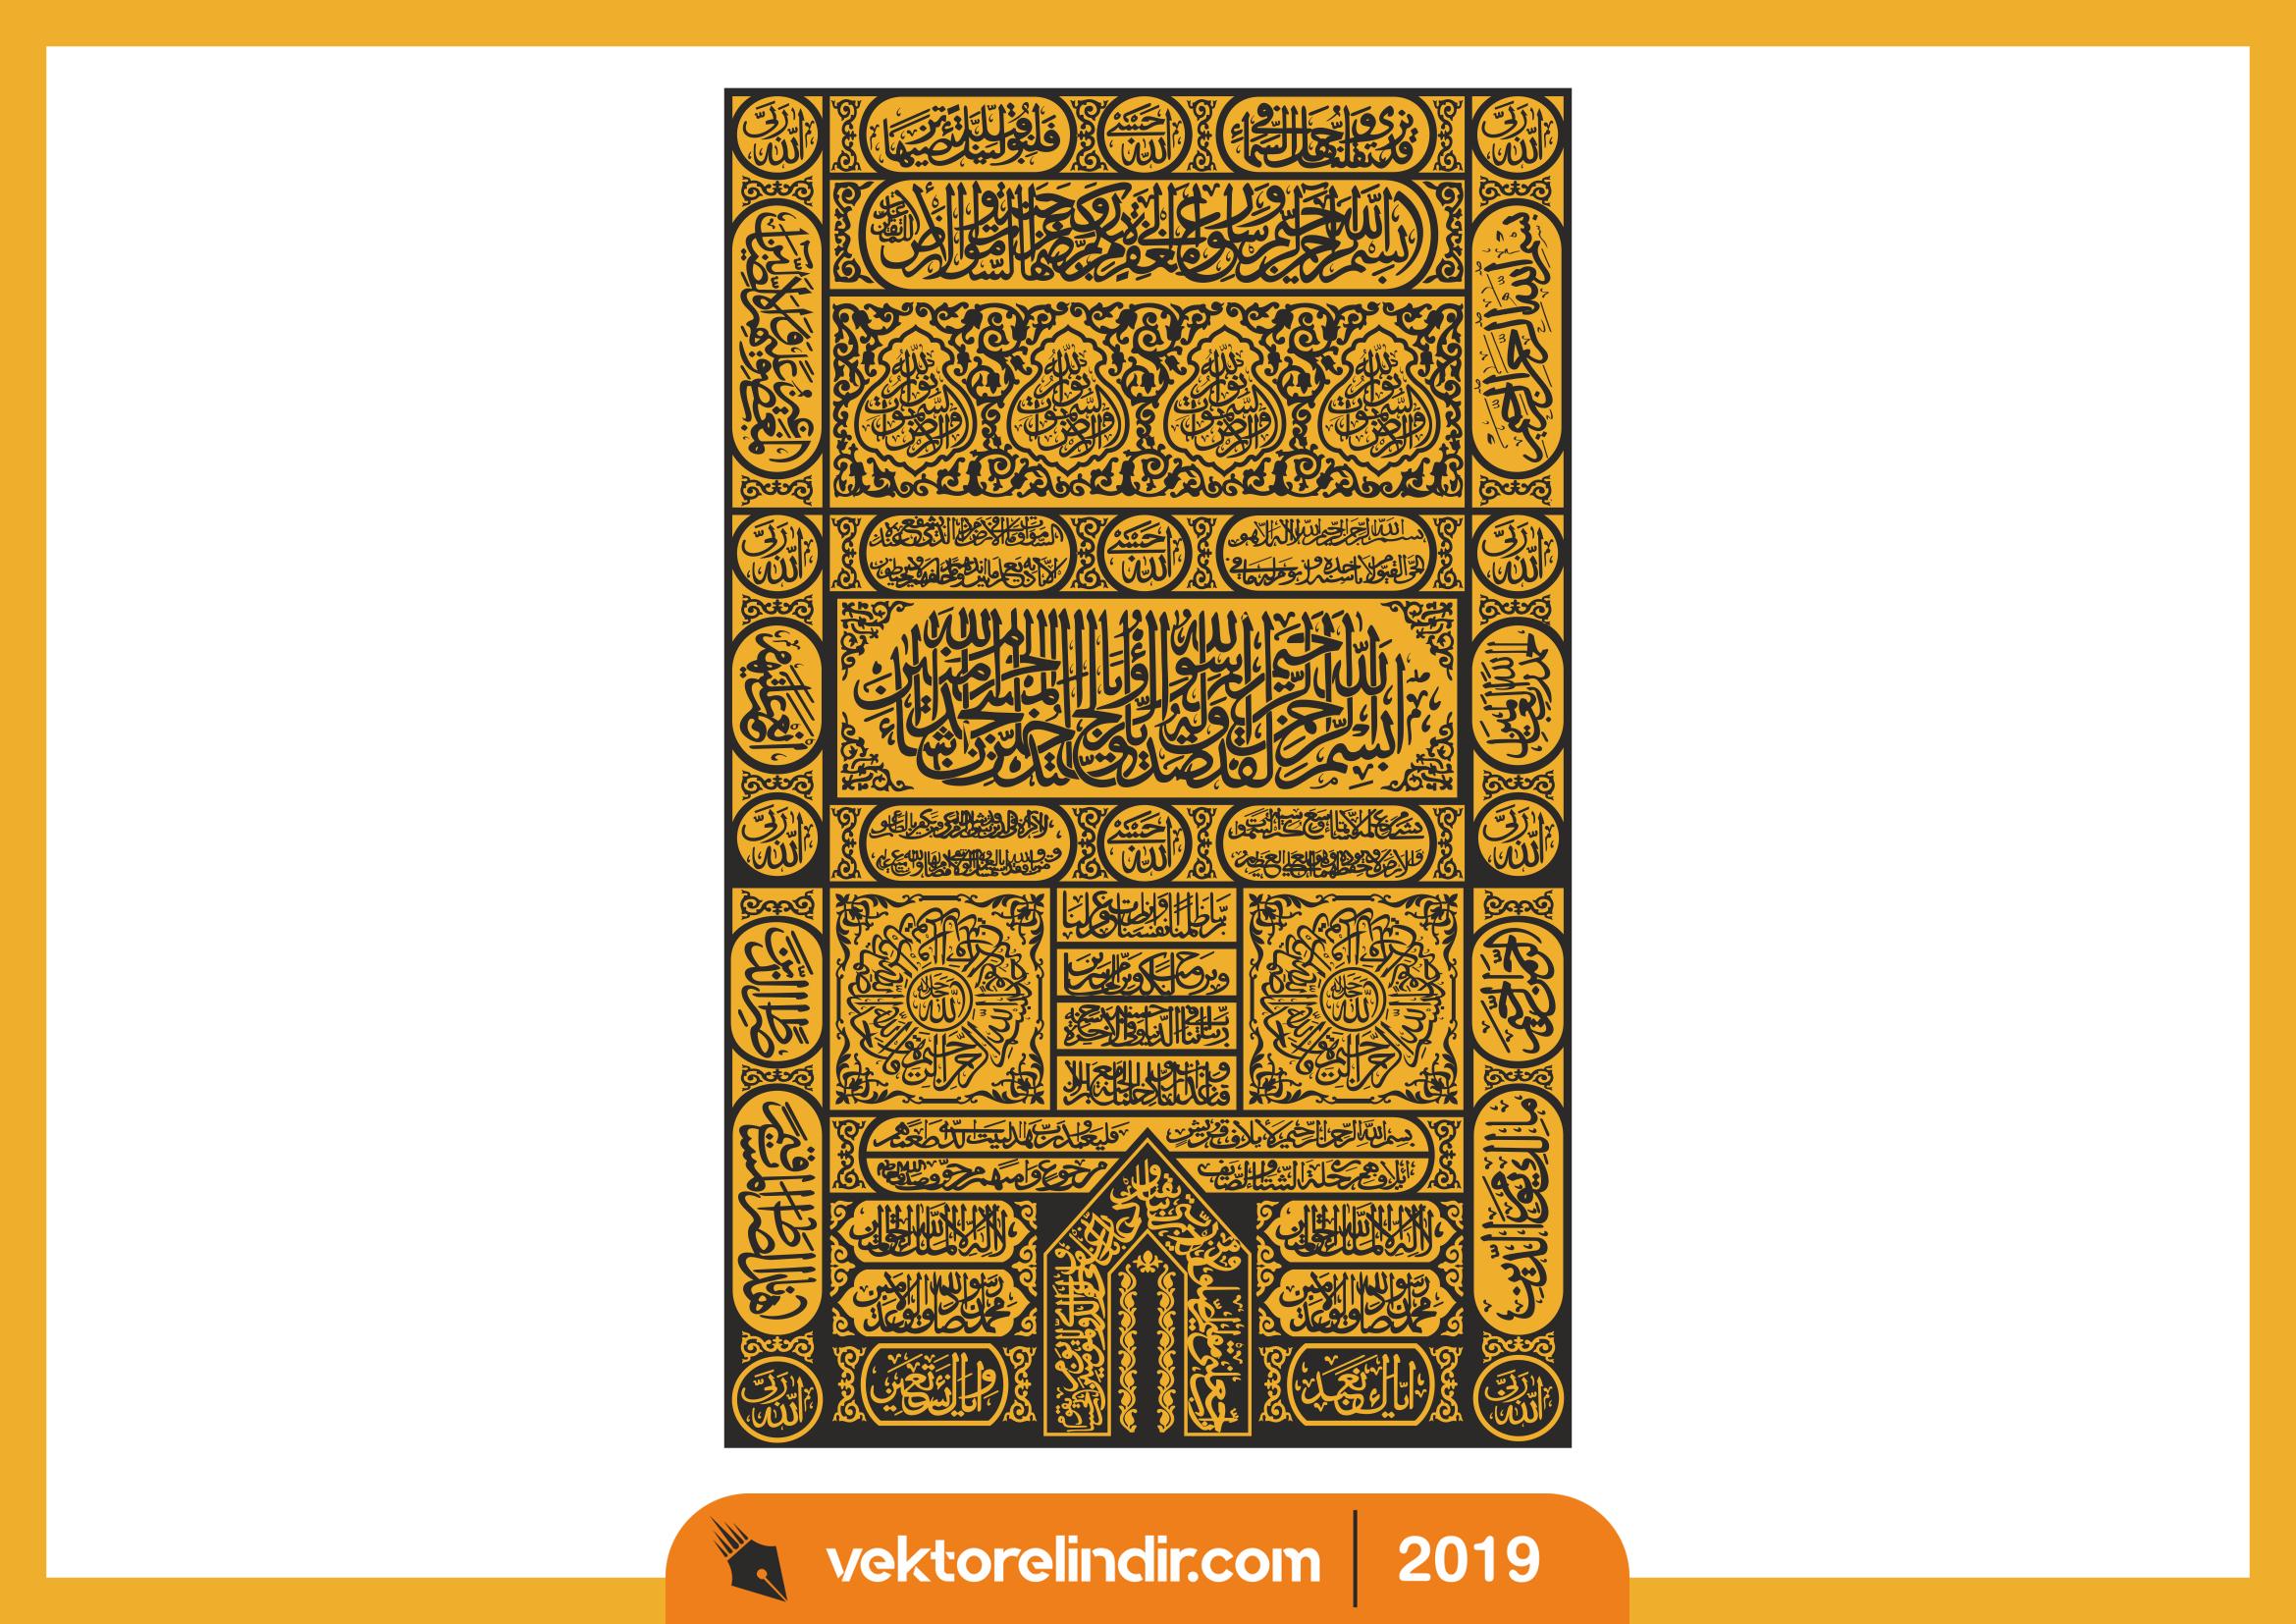 Kabe Kapısı Vektörel, Çizim, Dxf, İslami